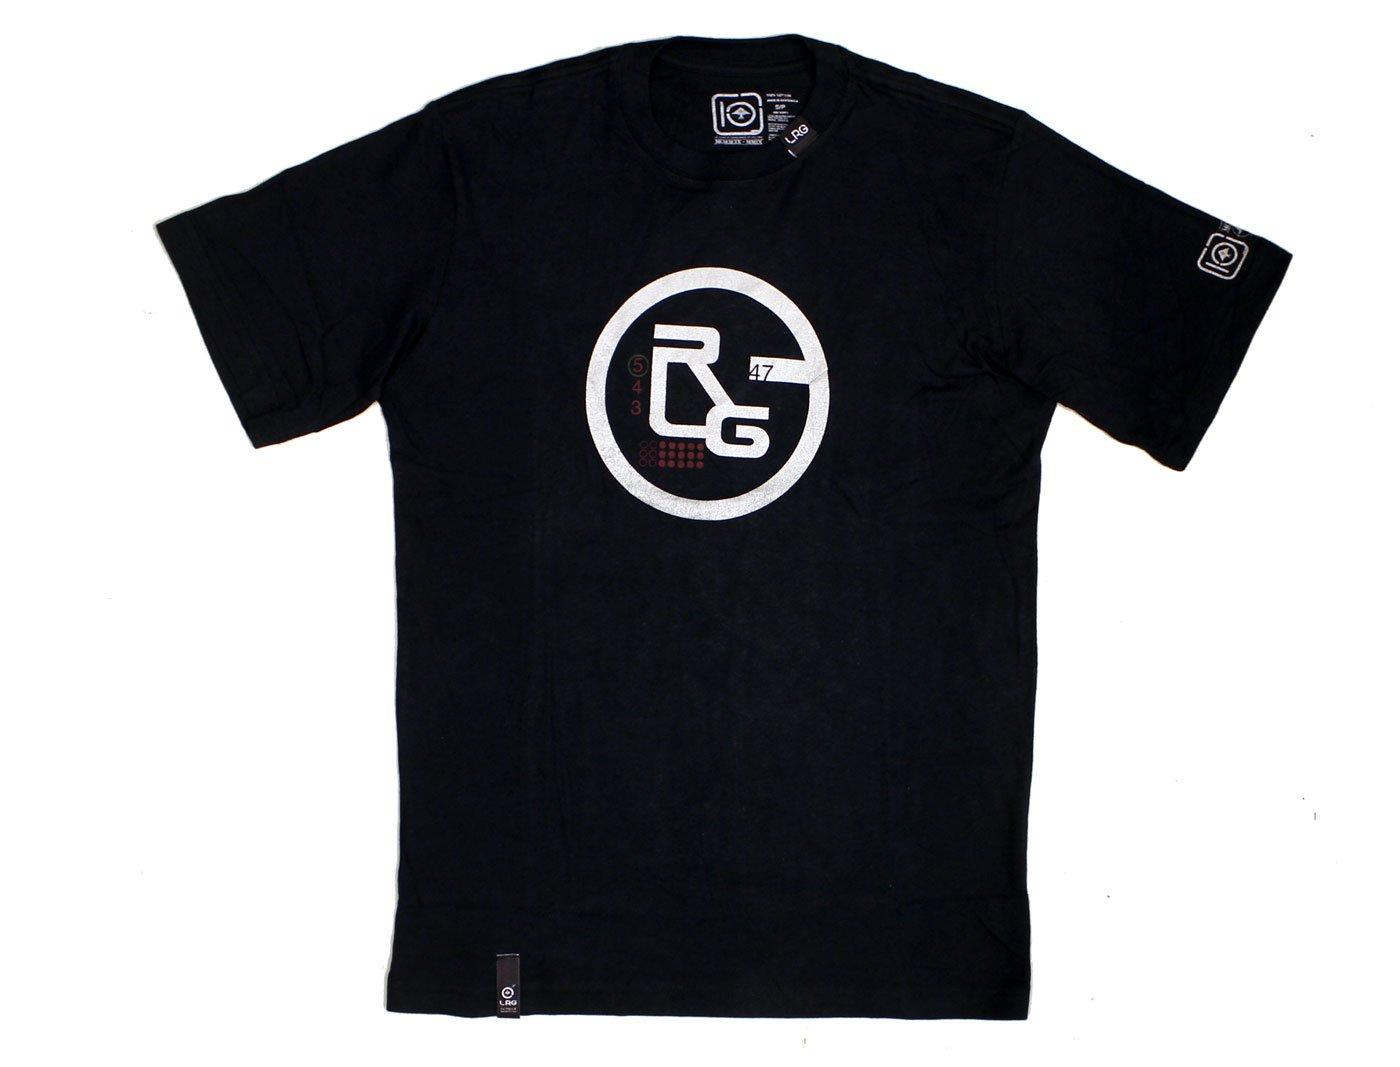 Lrg Cycle of Life T-shirt Black